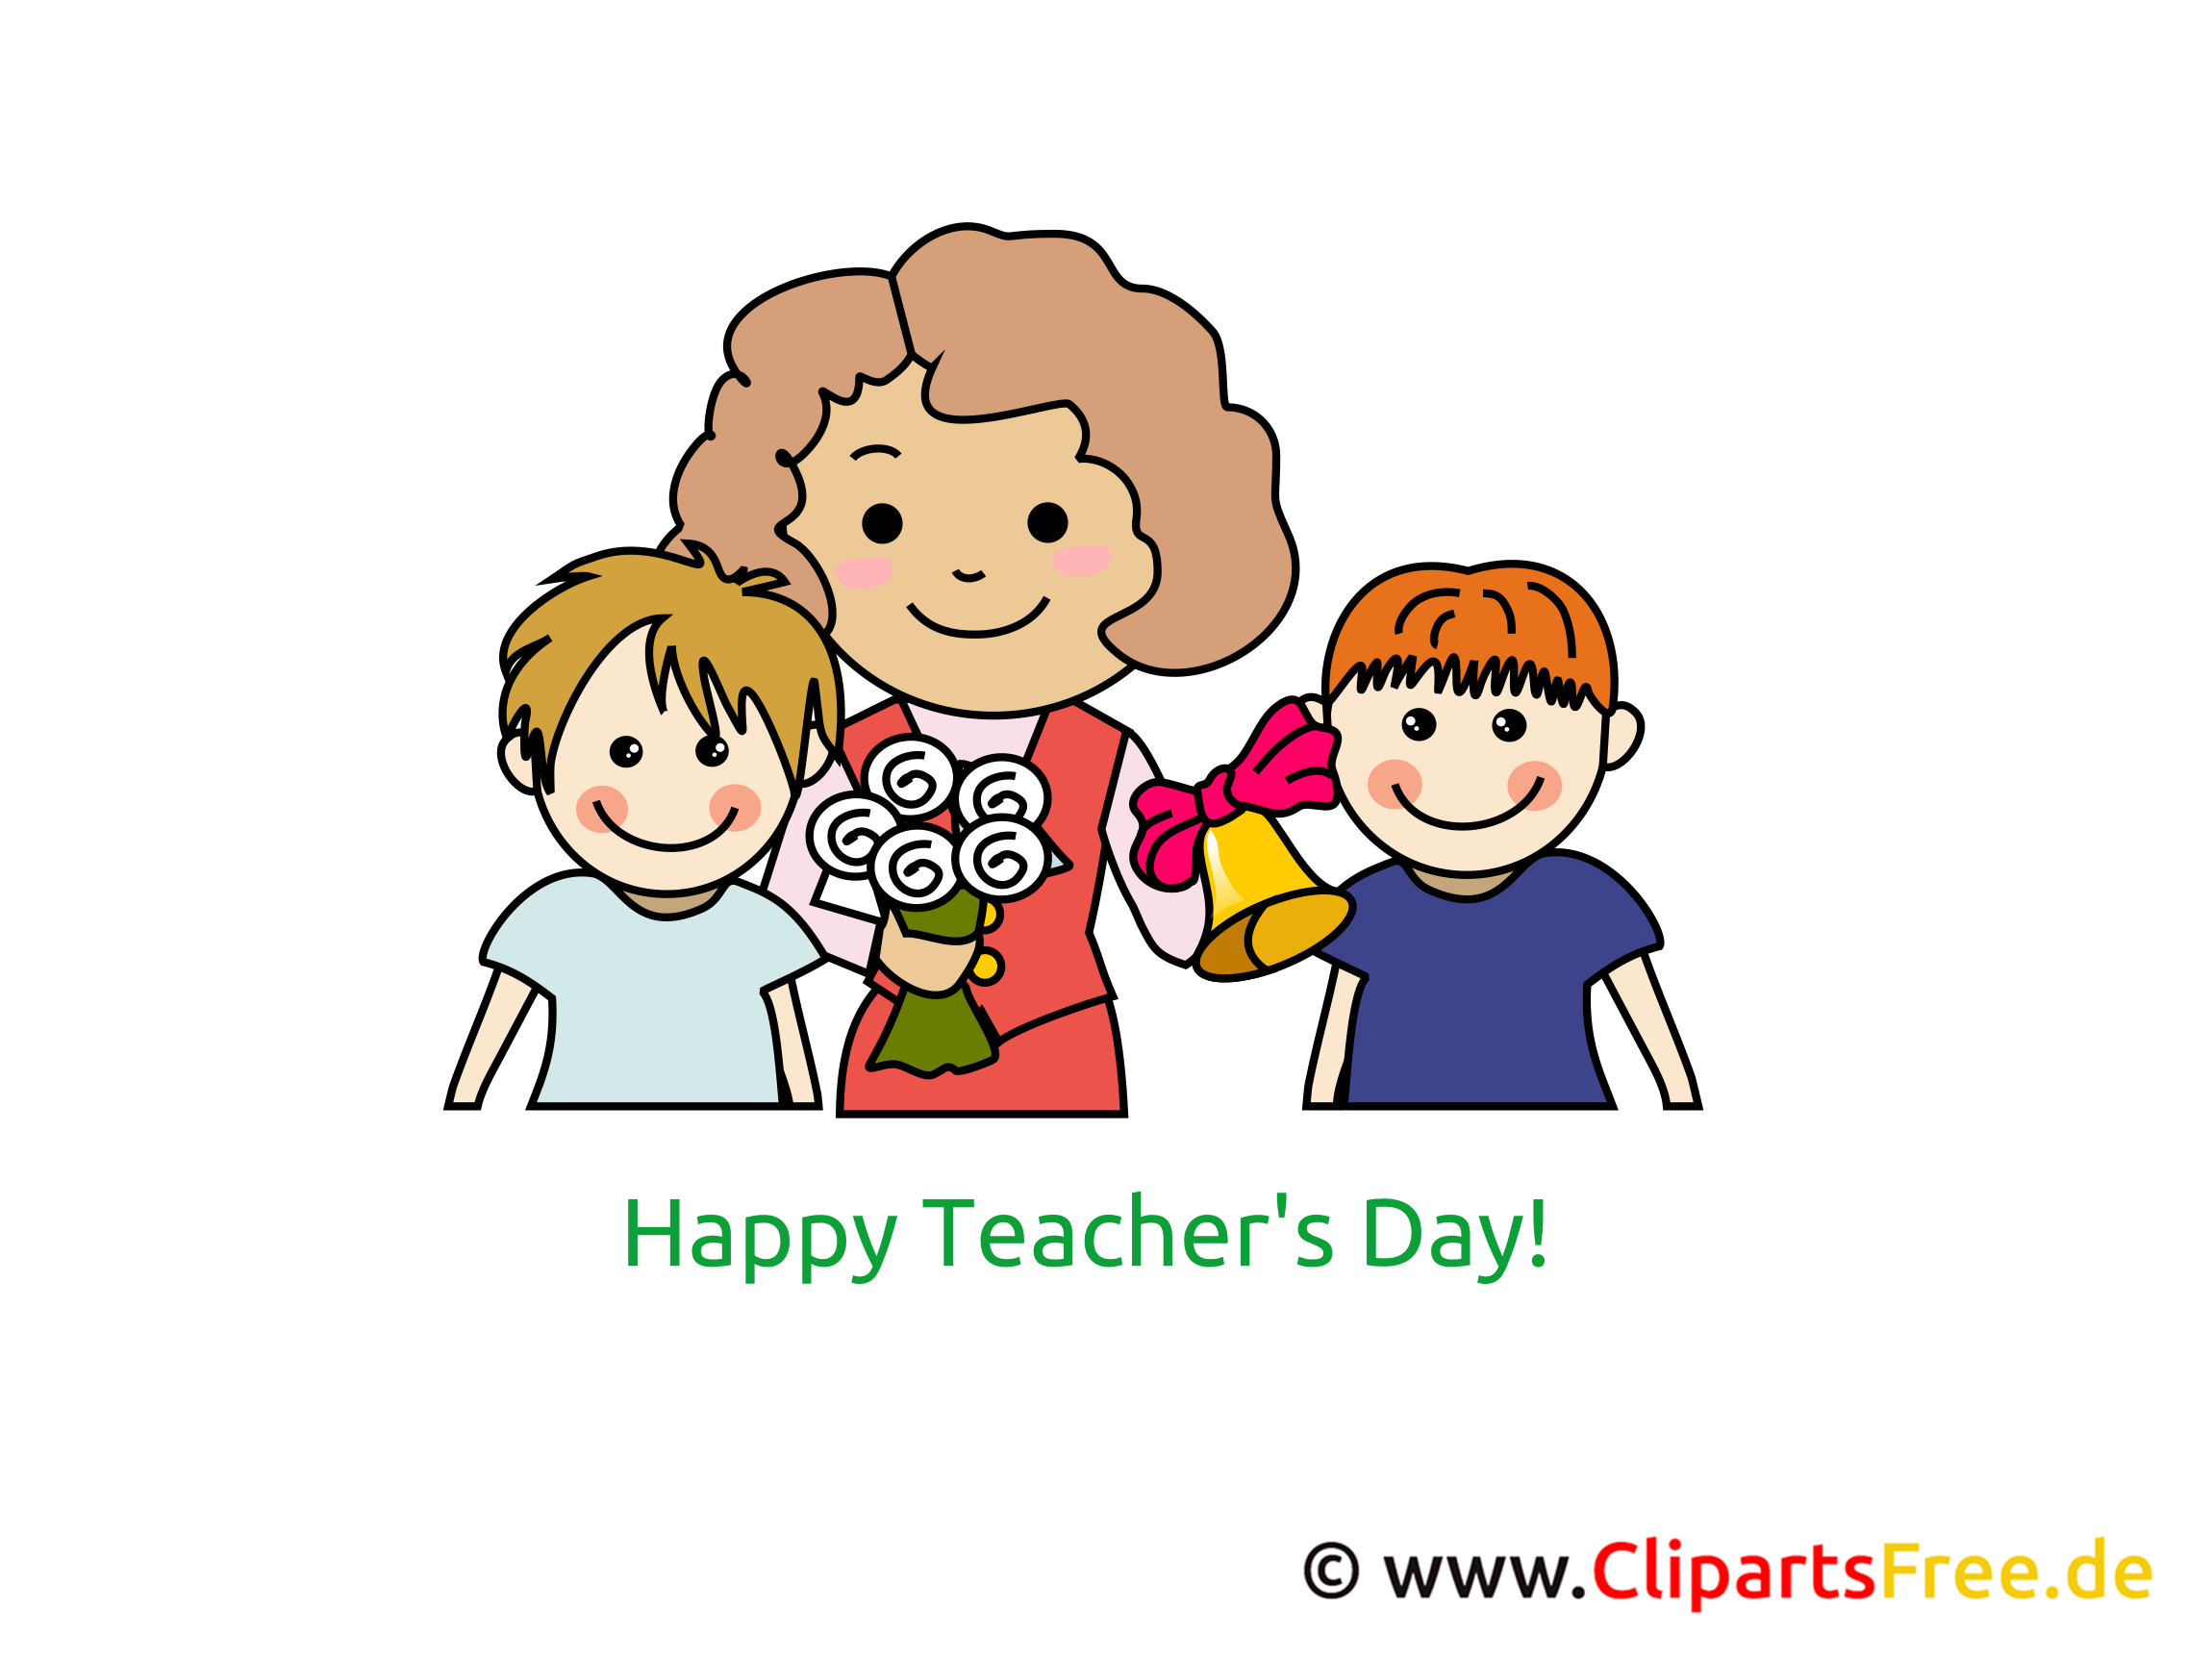 Lehrerin und Schüler Clipart, Bild, Glückwünsche